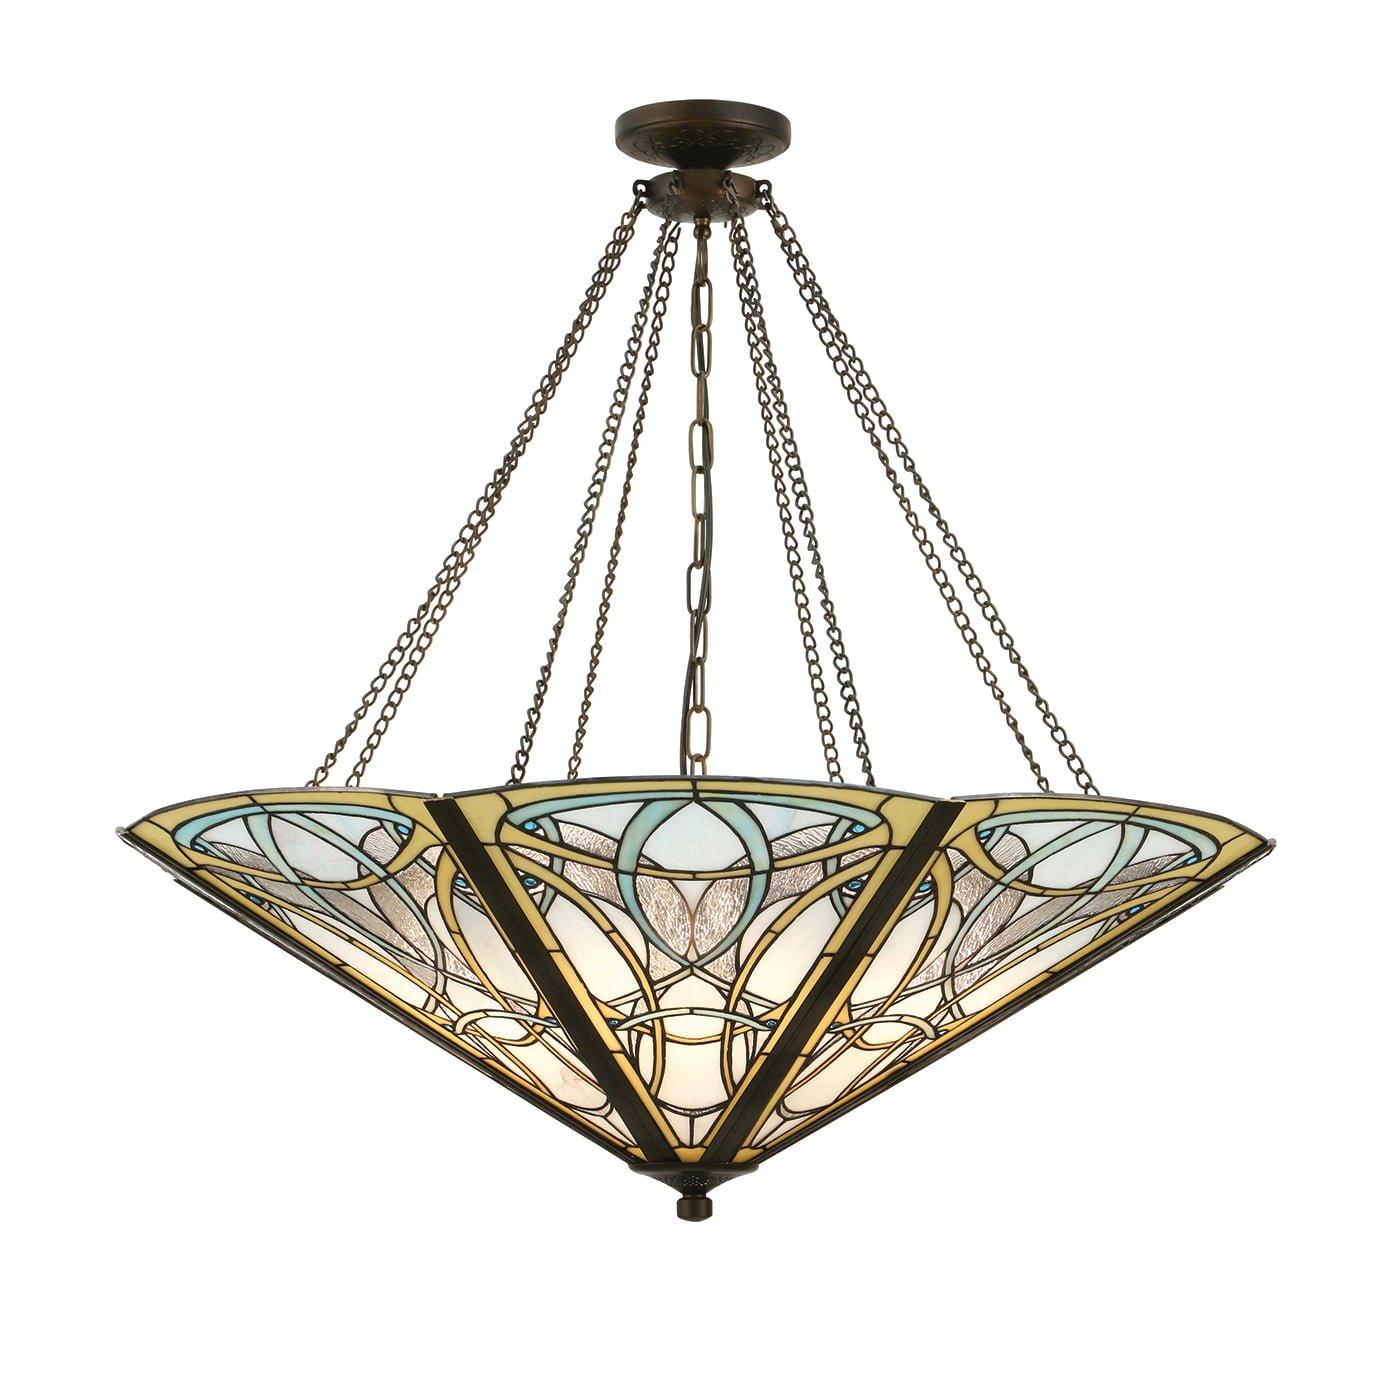 Interiors 1900 64053 Dauphine Mega panel inverted 8lt pendant, Tiffany